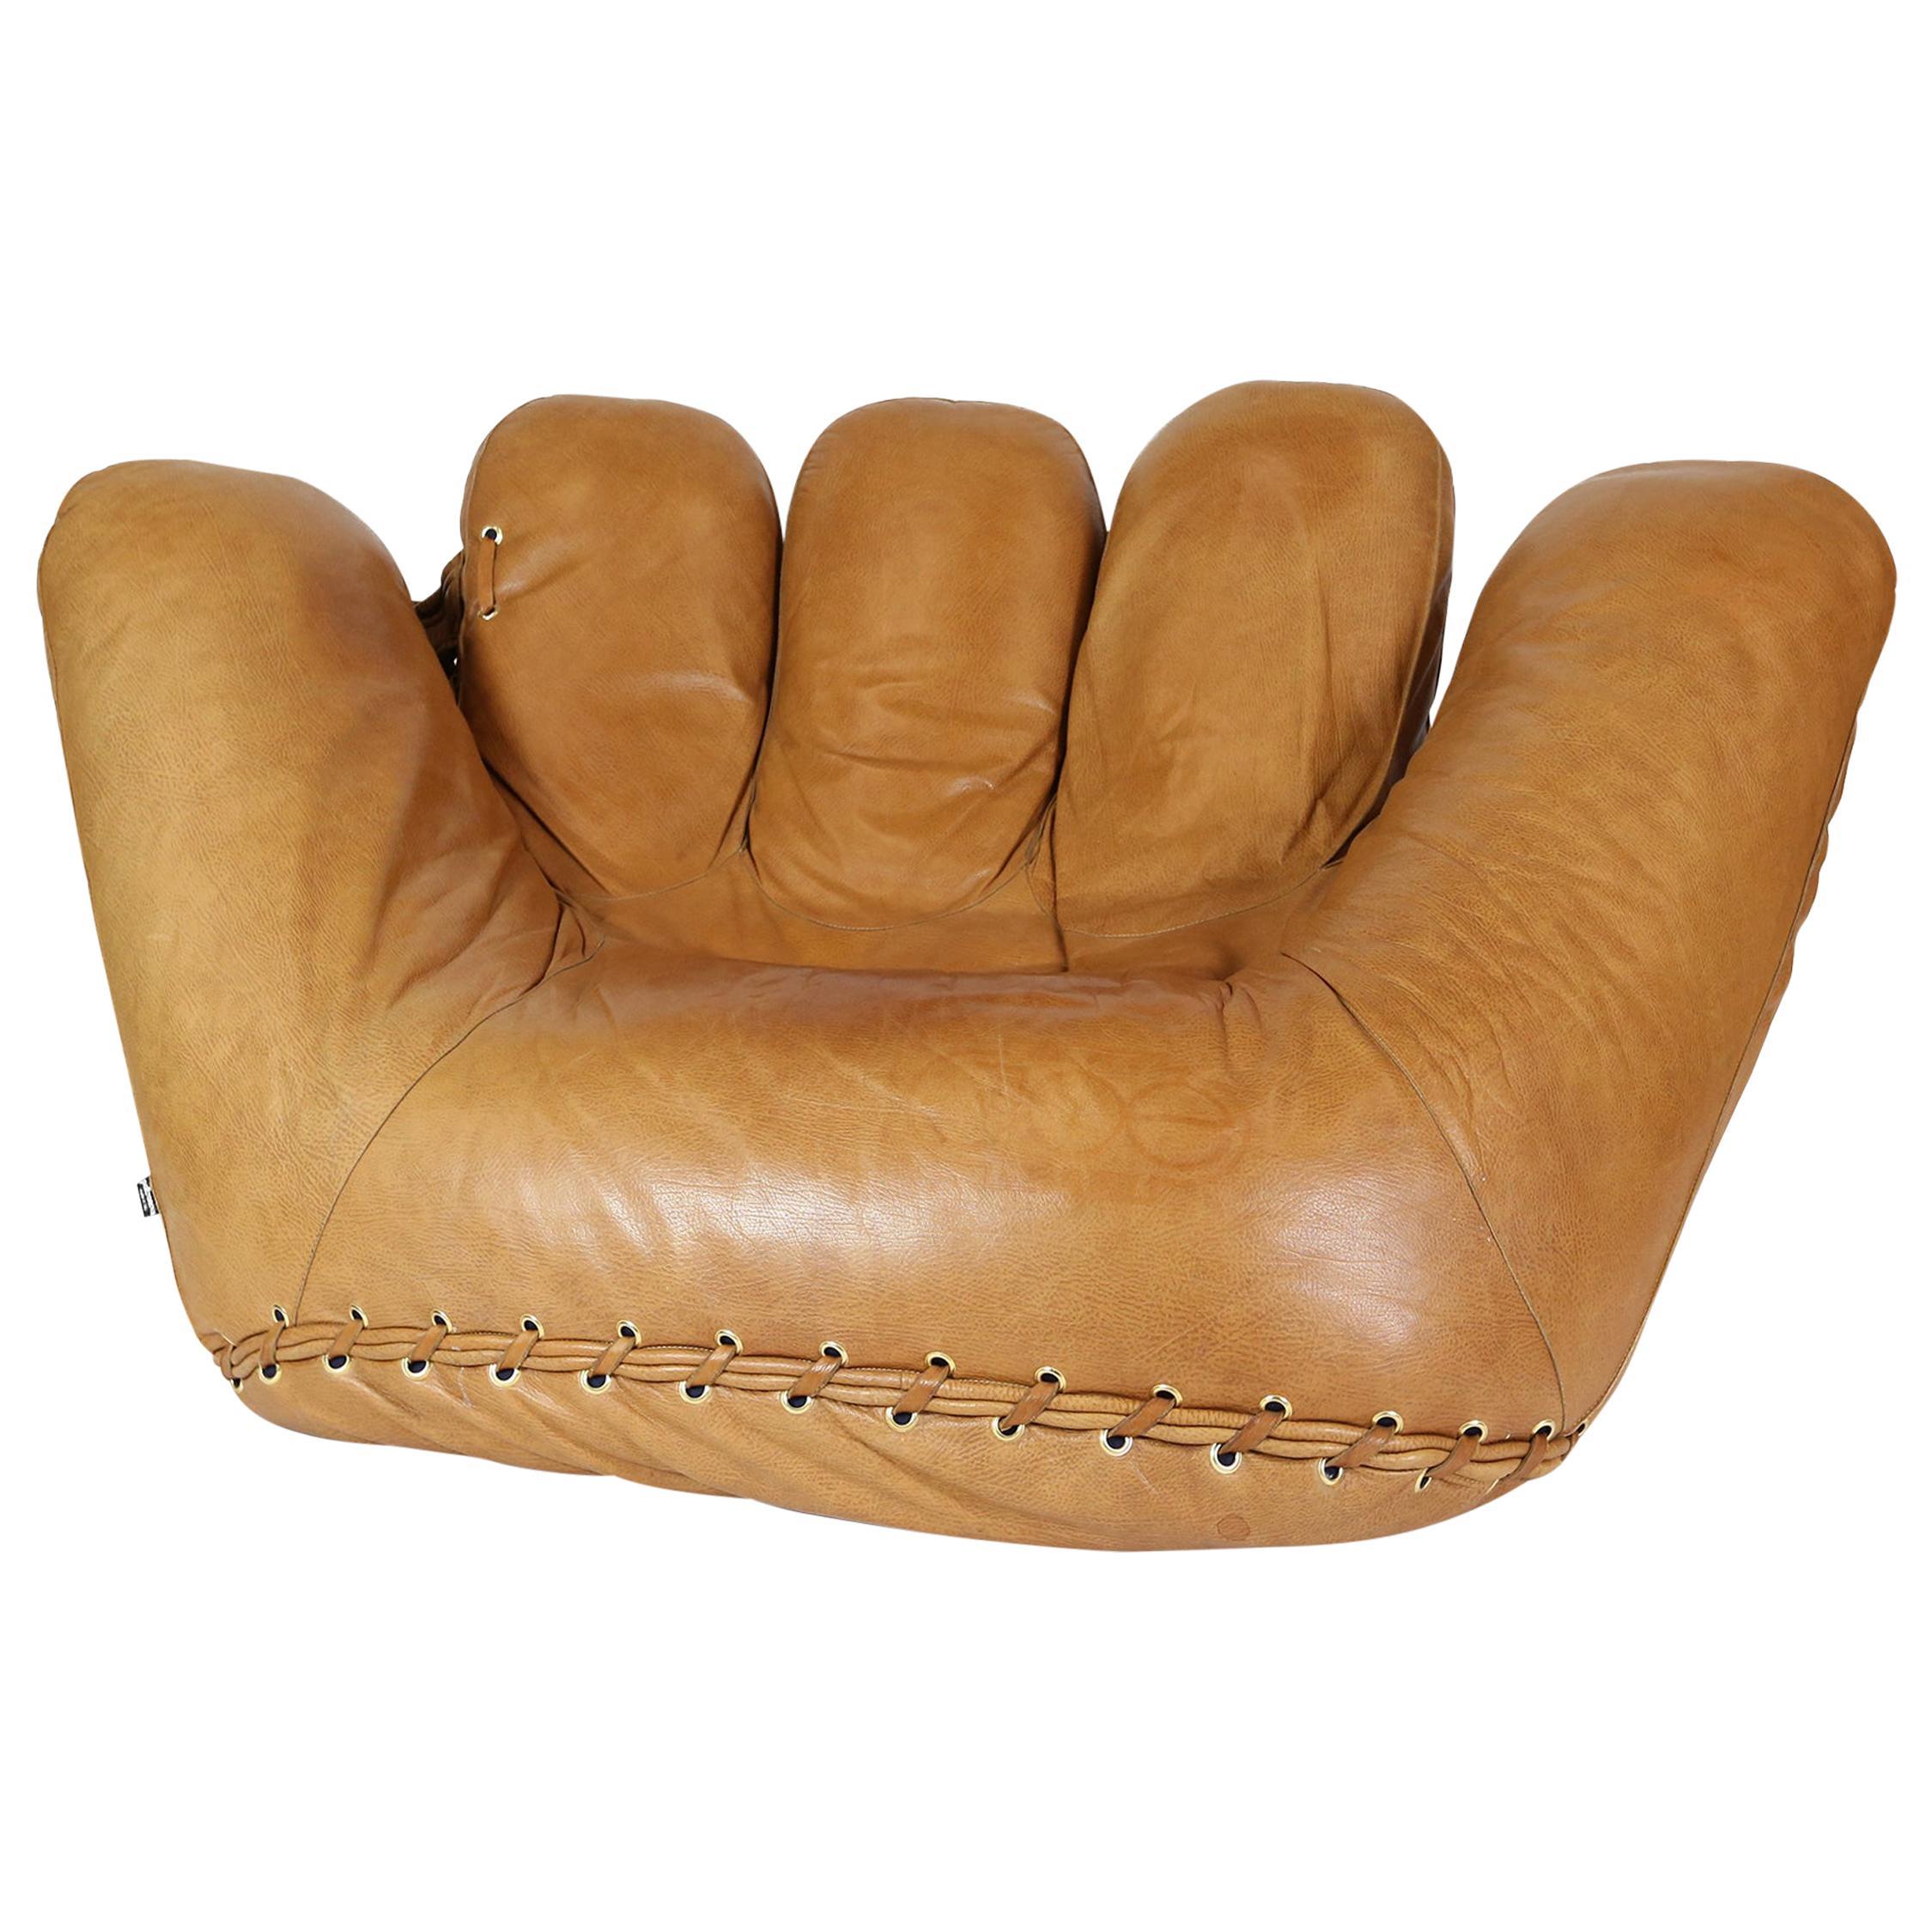 Early Original Cognac Leather 'Joe' Chair, De Pas -D-Urbino for Poltronova 1970s